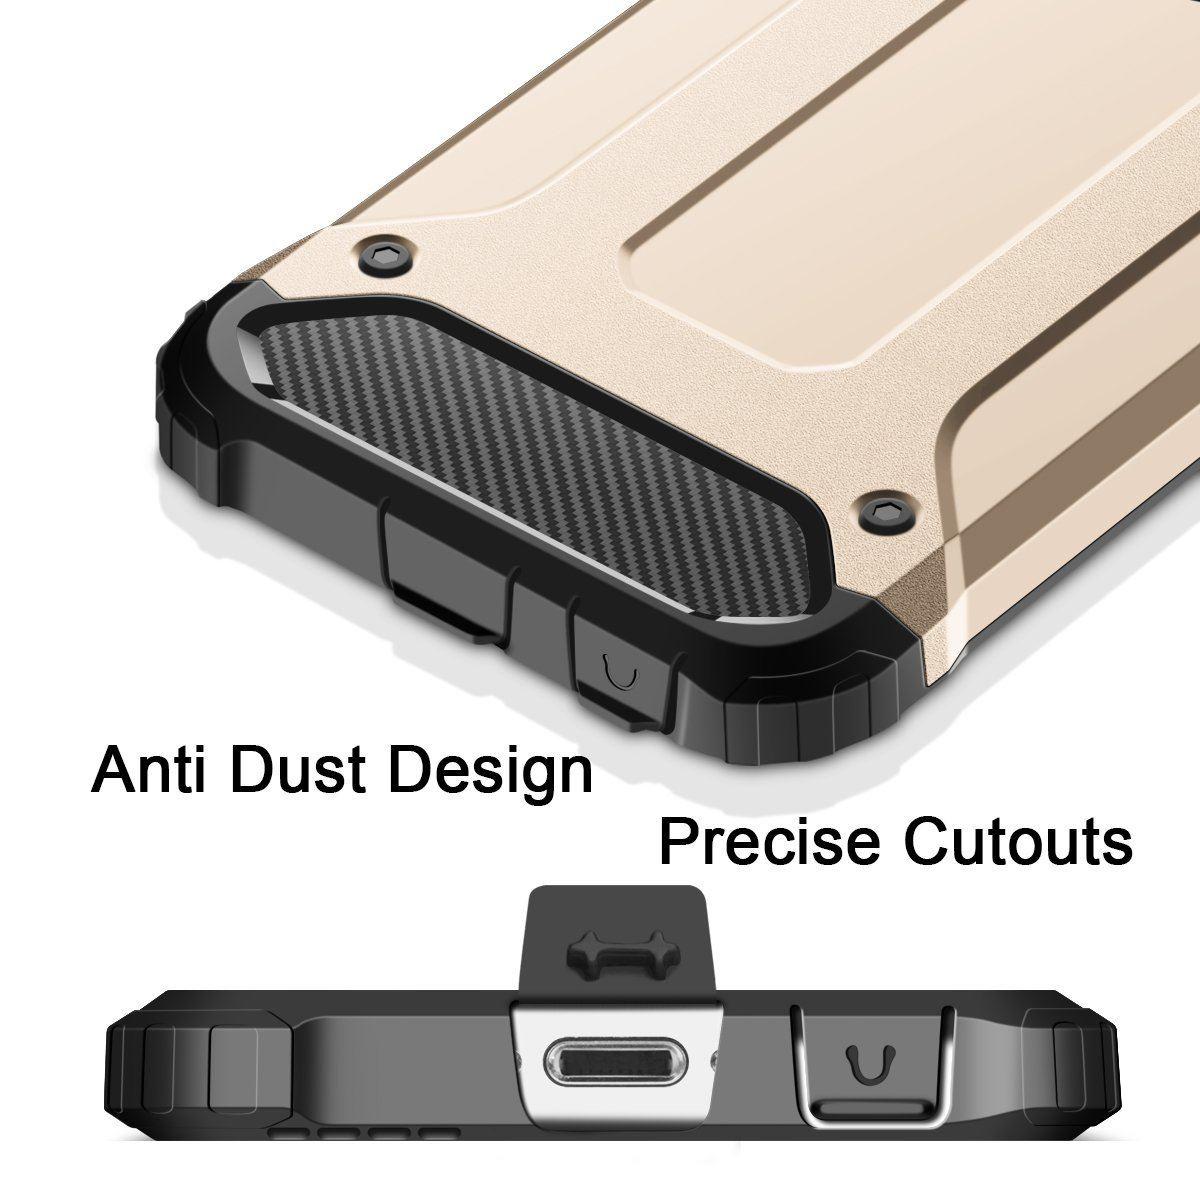 thumbnail 57 - For Apple iPhone 11 Pro Max XR Xs X 8 7 Plus 6 5 Se Case Cover Tough Armor